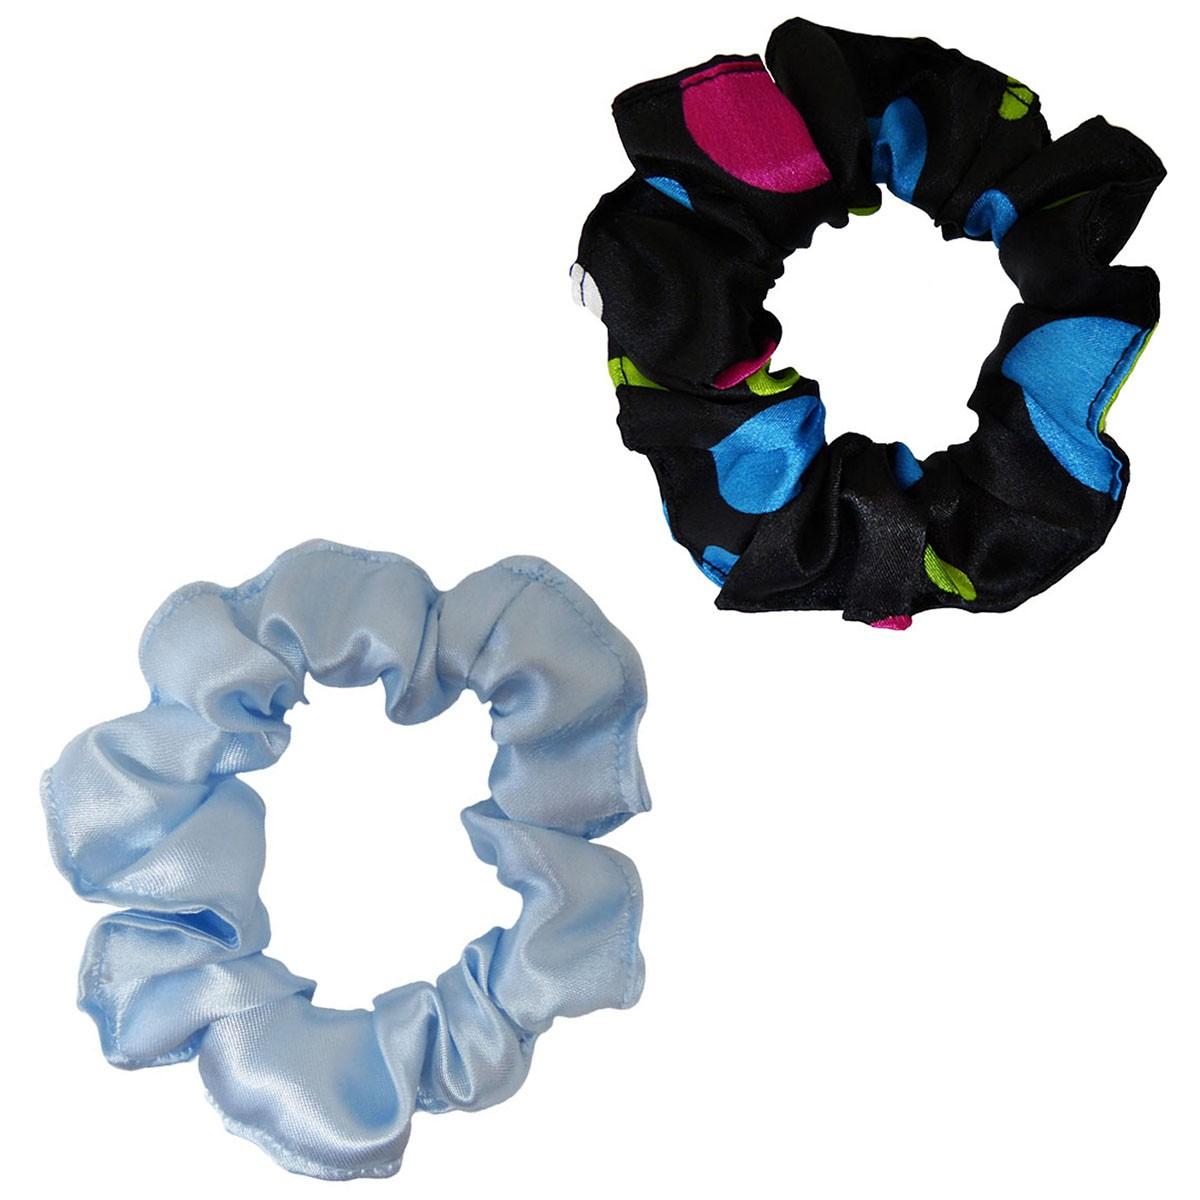 Kit Xuxinhas - Poá Colorido e Azul Claro - Anti Frizz